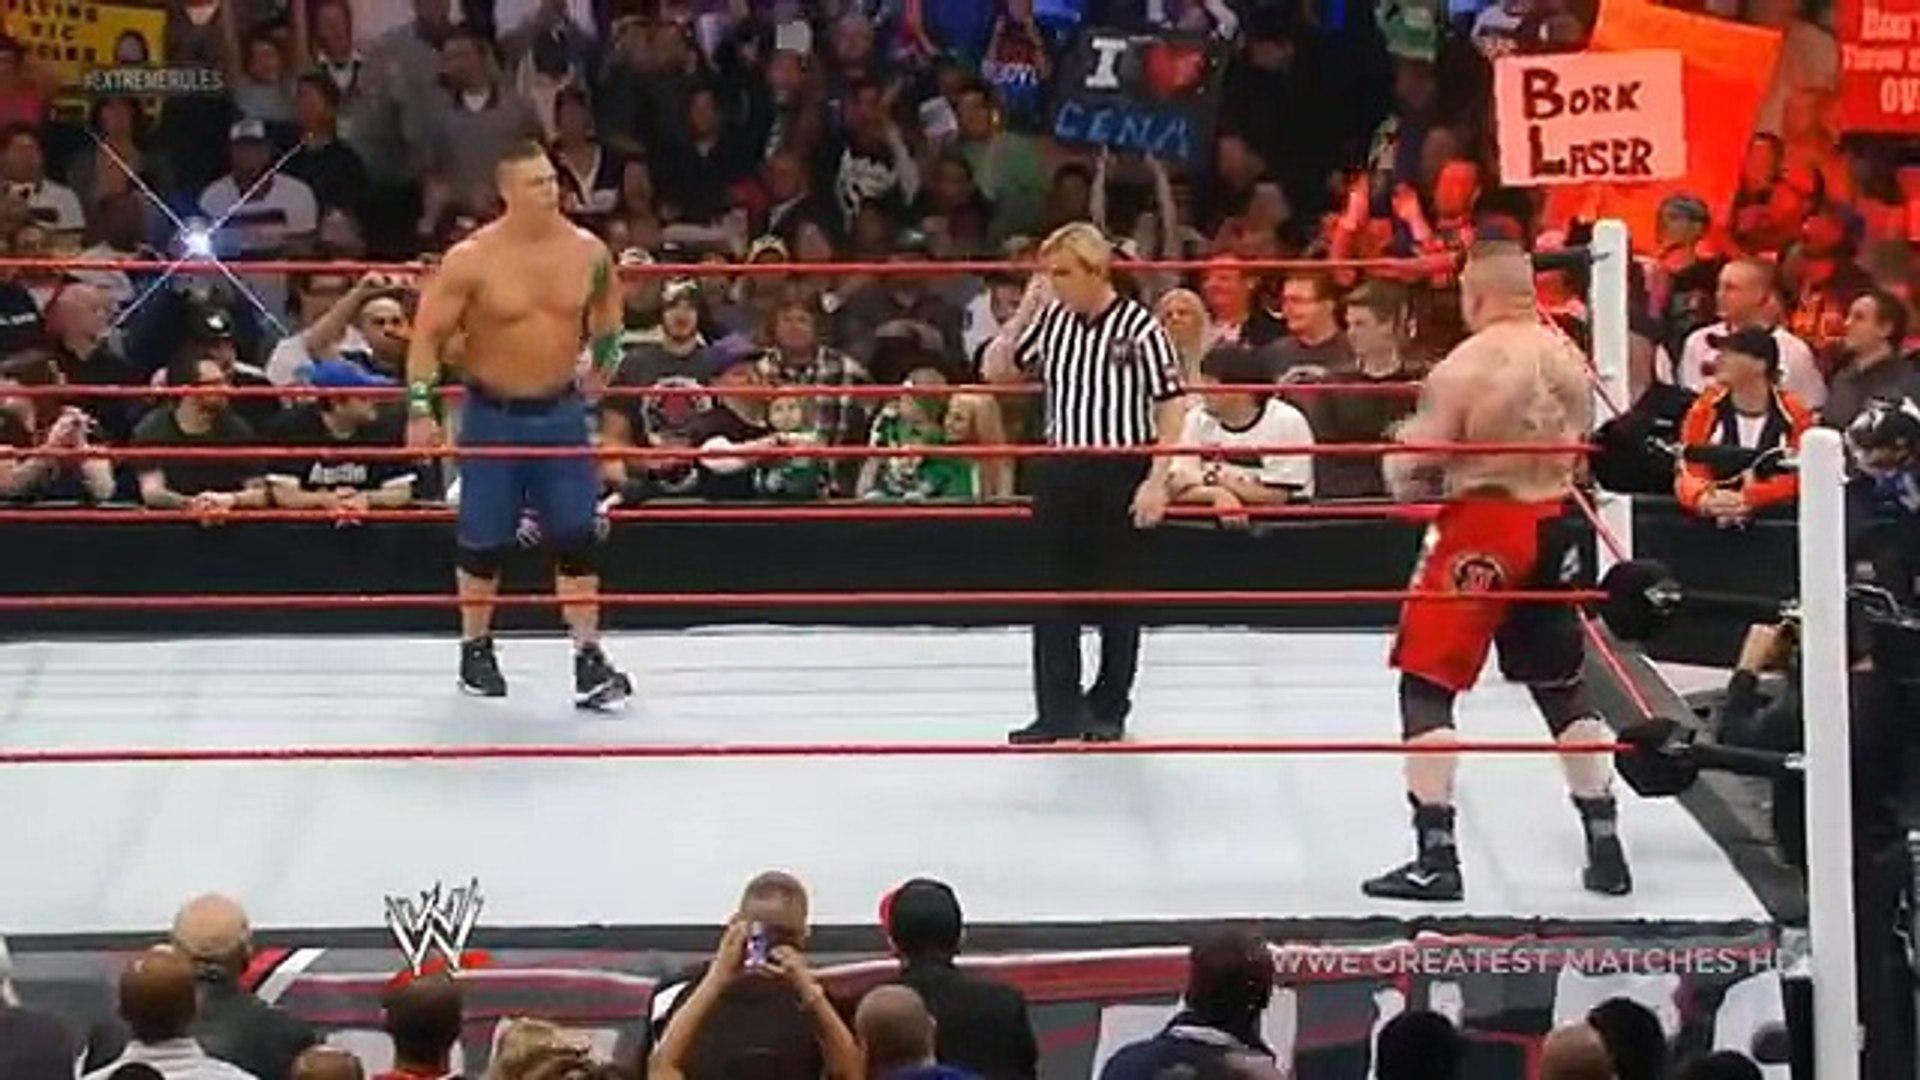 WWE 2017 - WWE Extreme Rules 4th June 2017 Jhon Cena Vs Brock Lesnar - Heavyweight WWE Championship